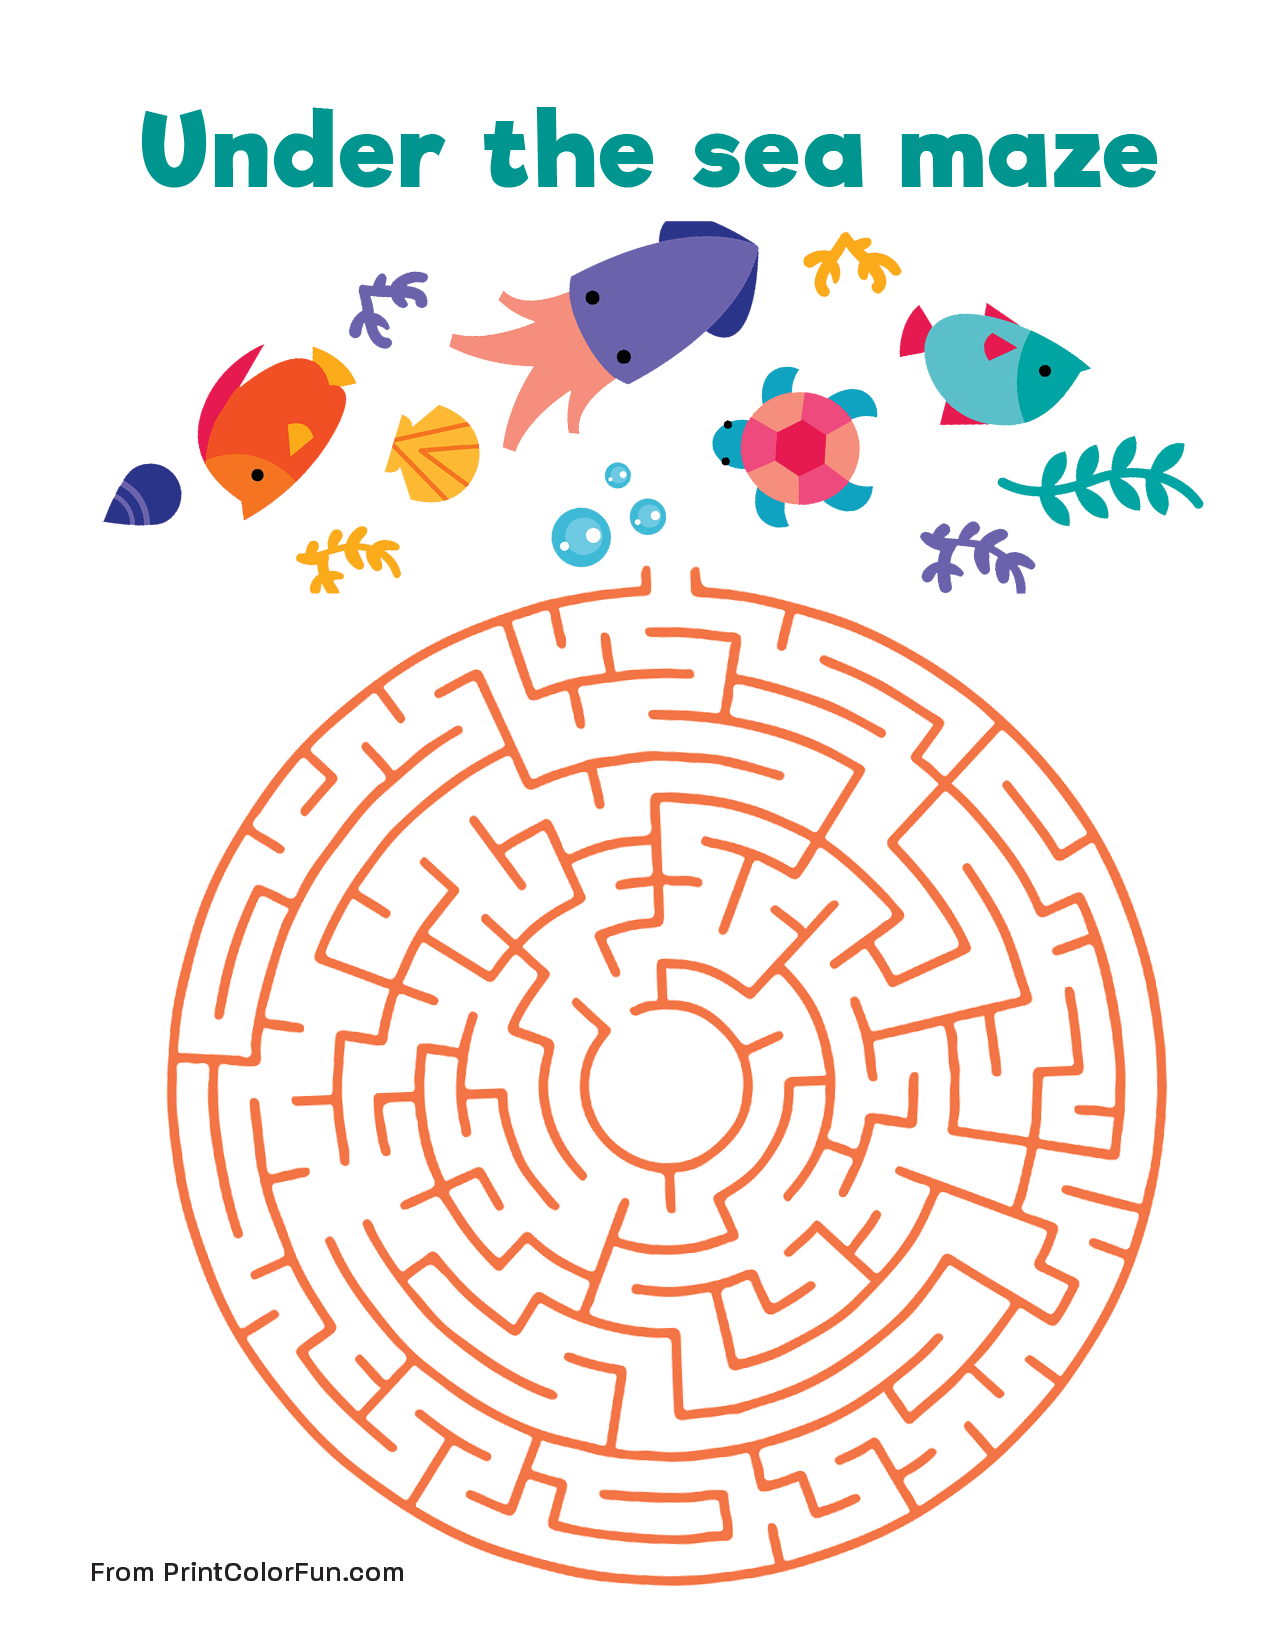 Under the sea maze Medium level coloring page Print